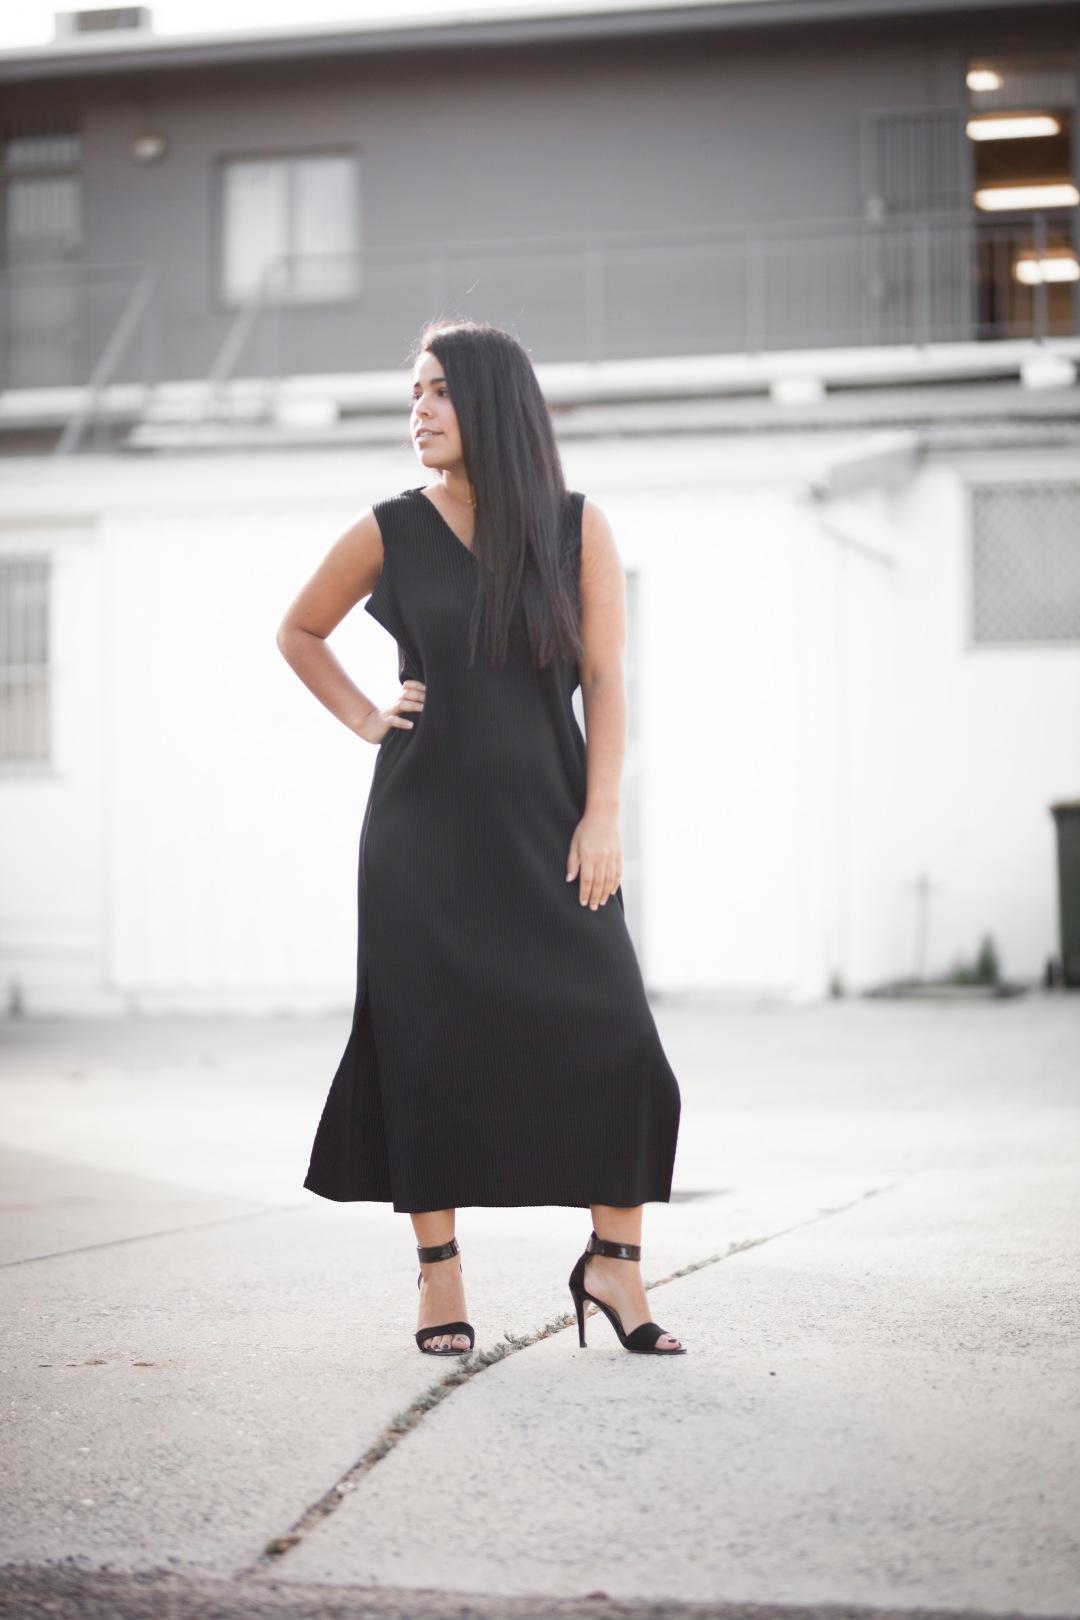 The Shapeless Dress